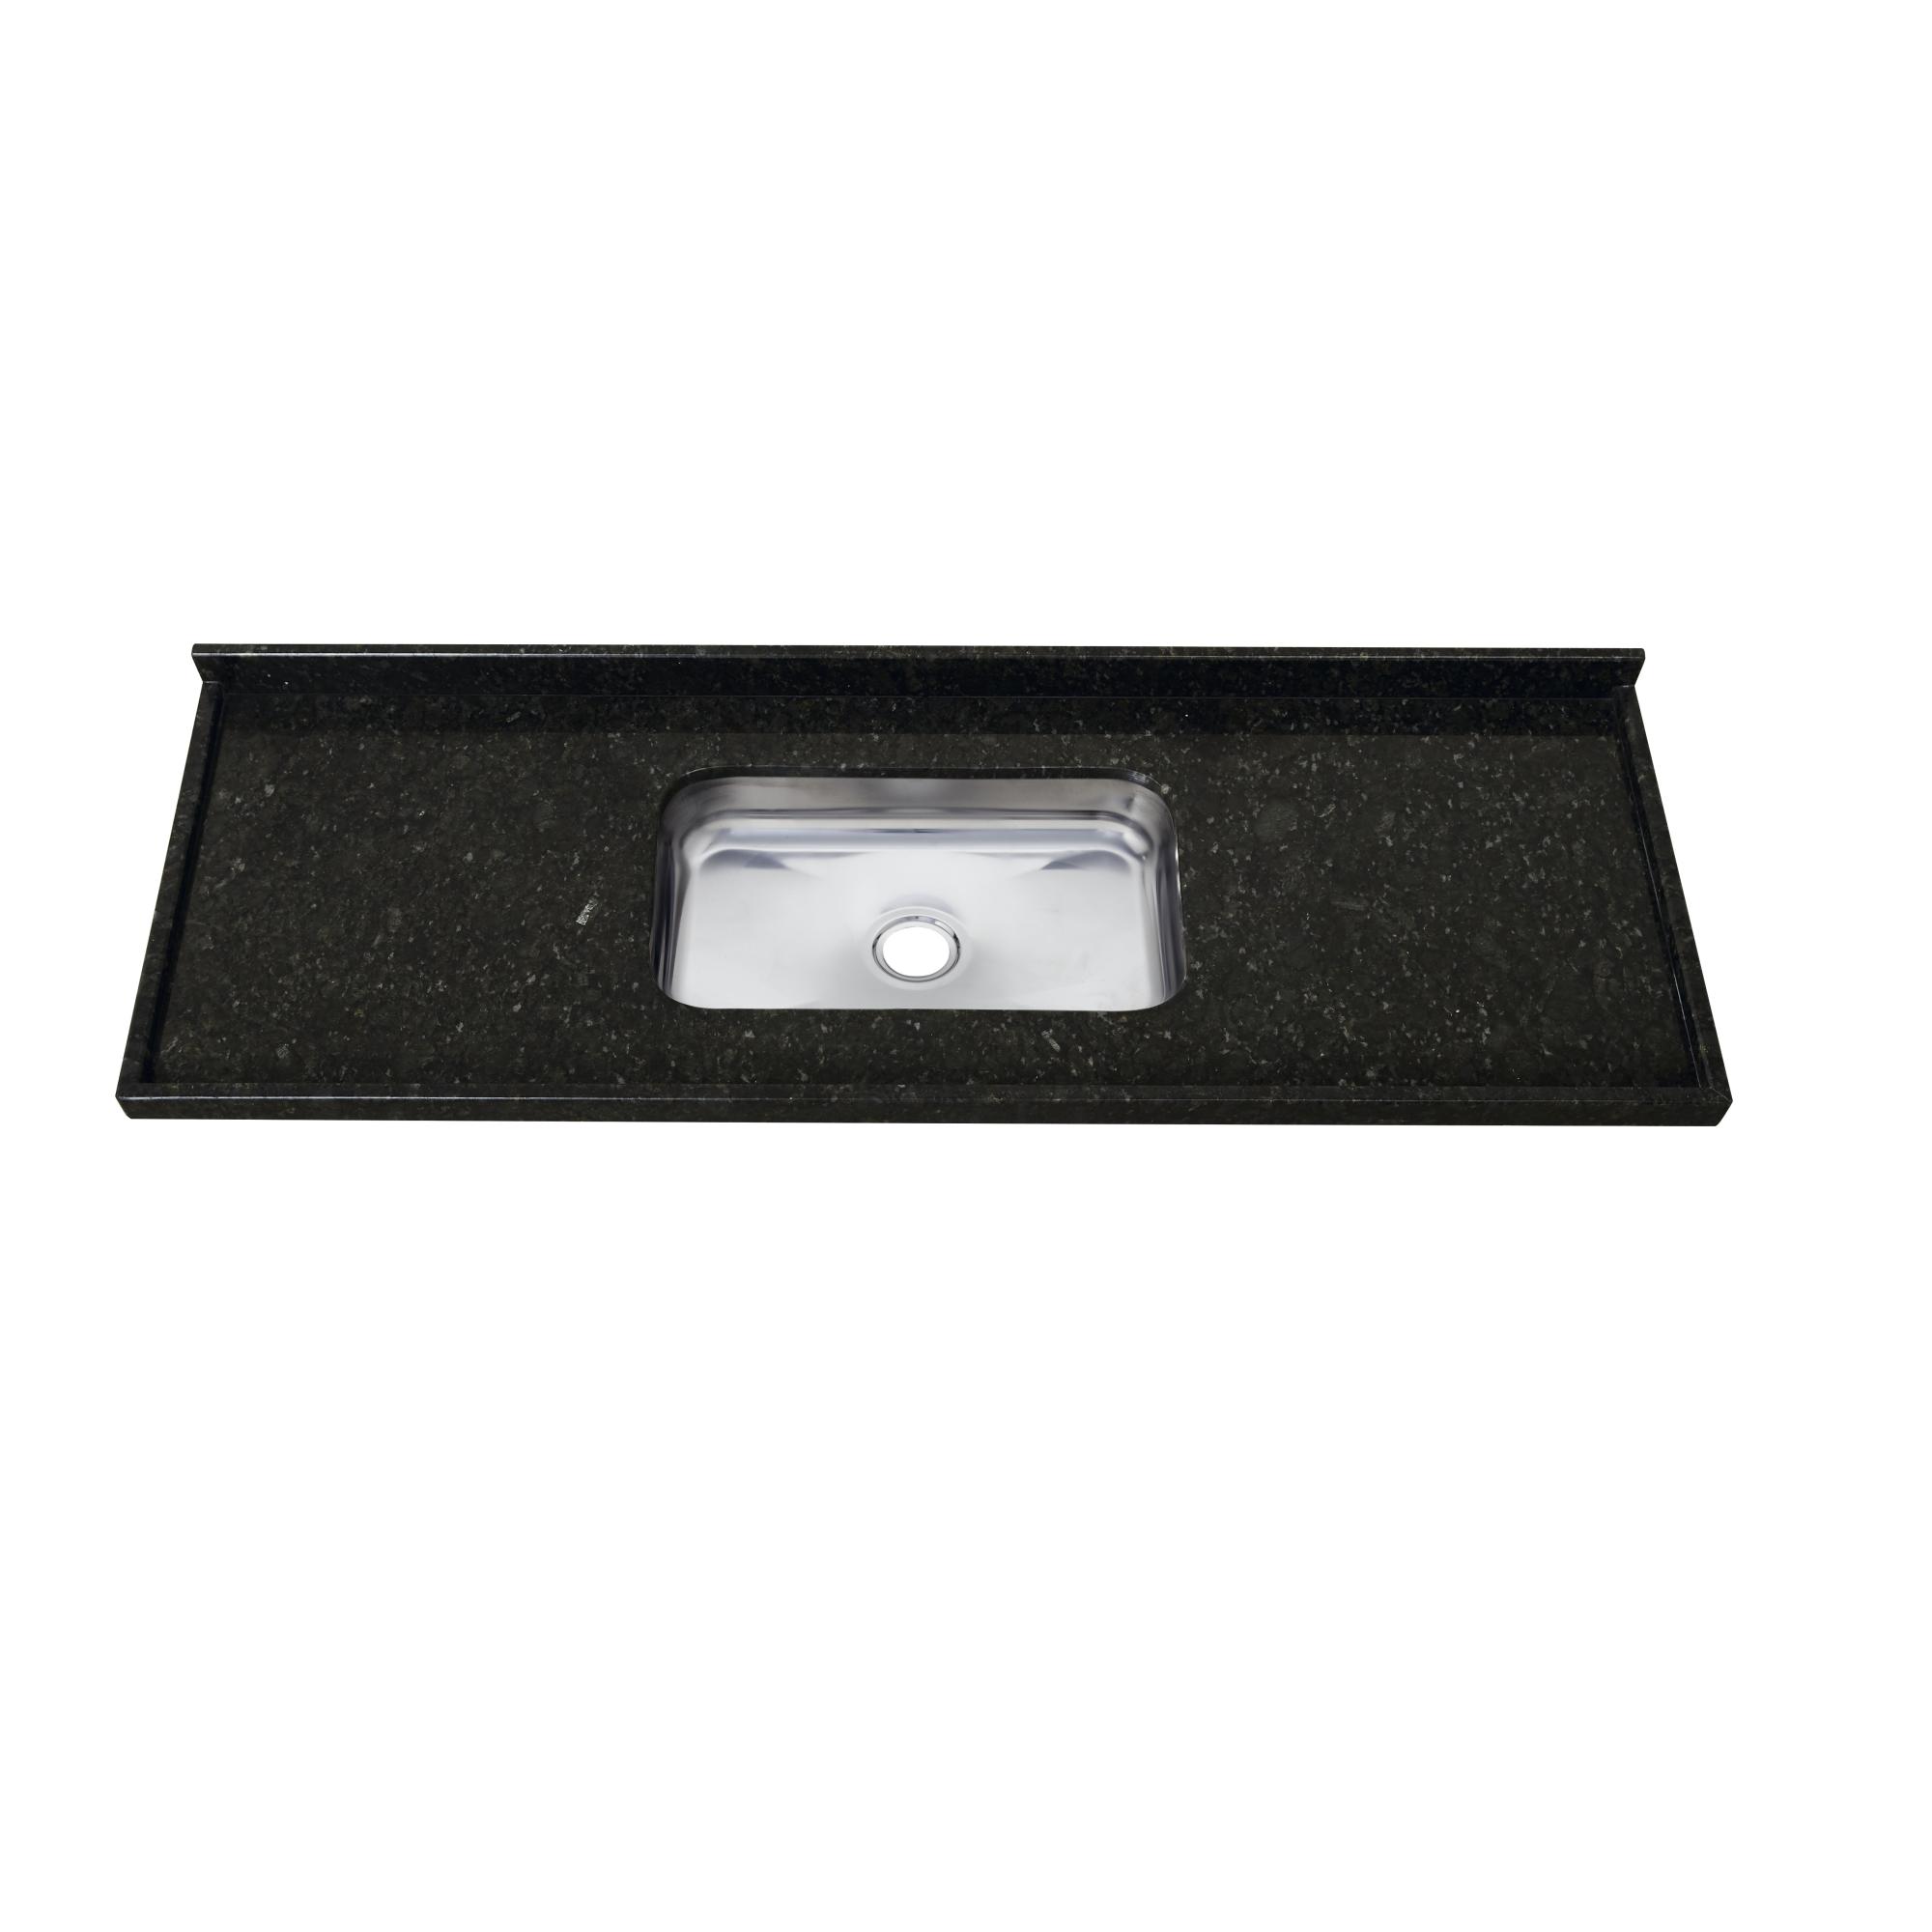 Pia Simples para Cozinha de Granito Brilho 180cm x 55cm Verde Escuro - 50111228 - Pop Venturini